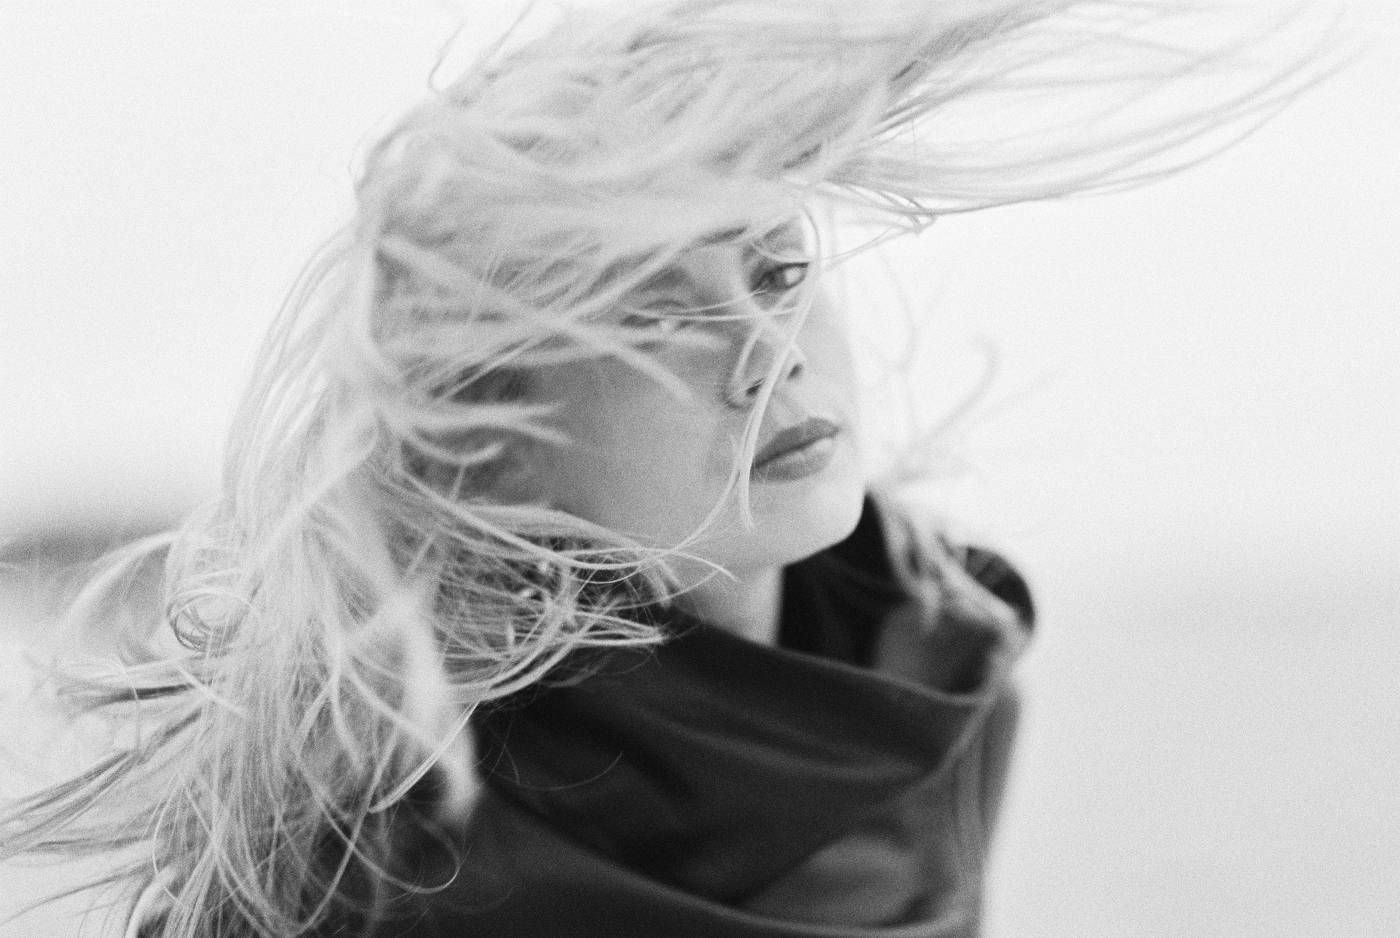 Stefanie Höpner, Kodak TX400 35mm - https://www.facebook.com/SoulSeasonPhoto